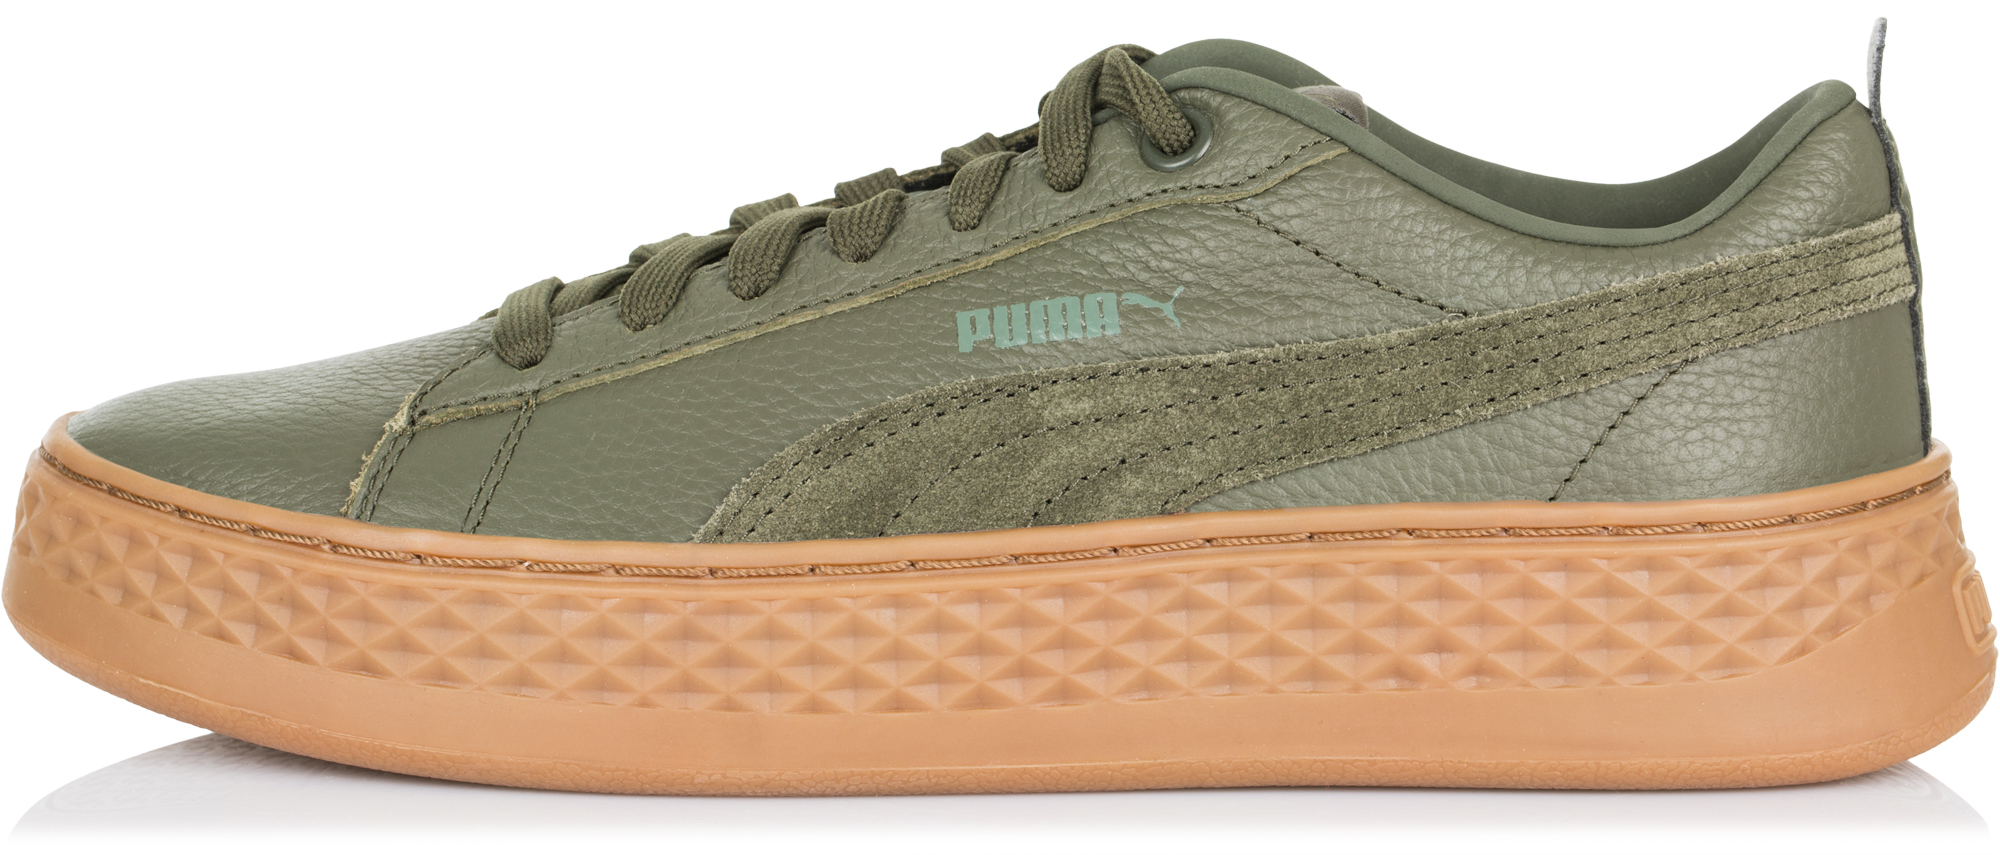 Puma Кеды женские Puma Smash Platform